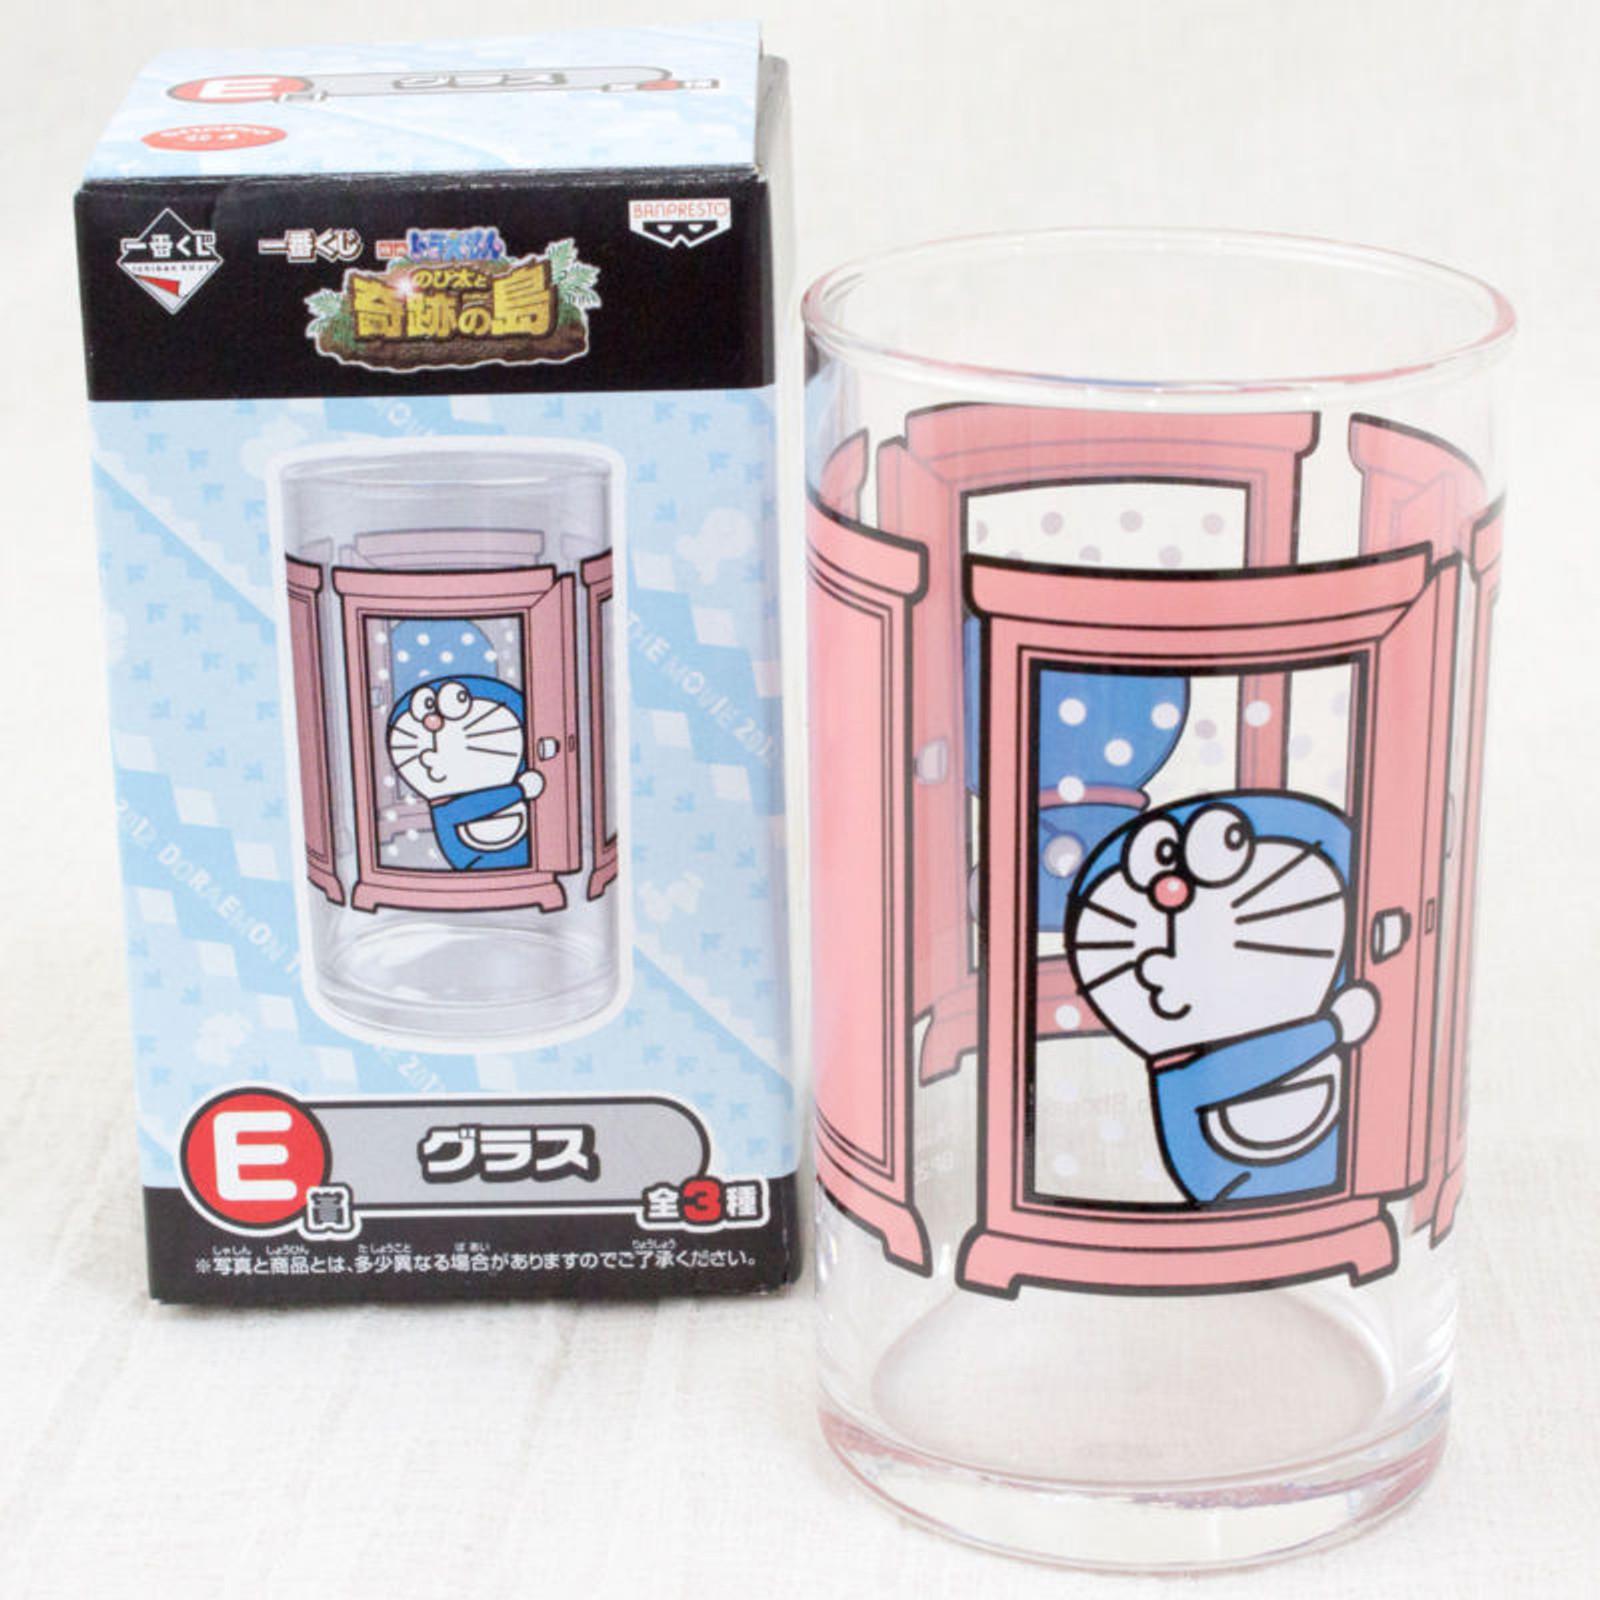 Doraemon The Movie 2012 Visual Art Glass Banpresto JAPAN ANIME MANGA FUJIO 2